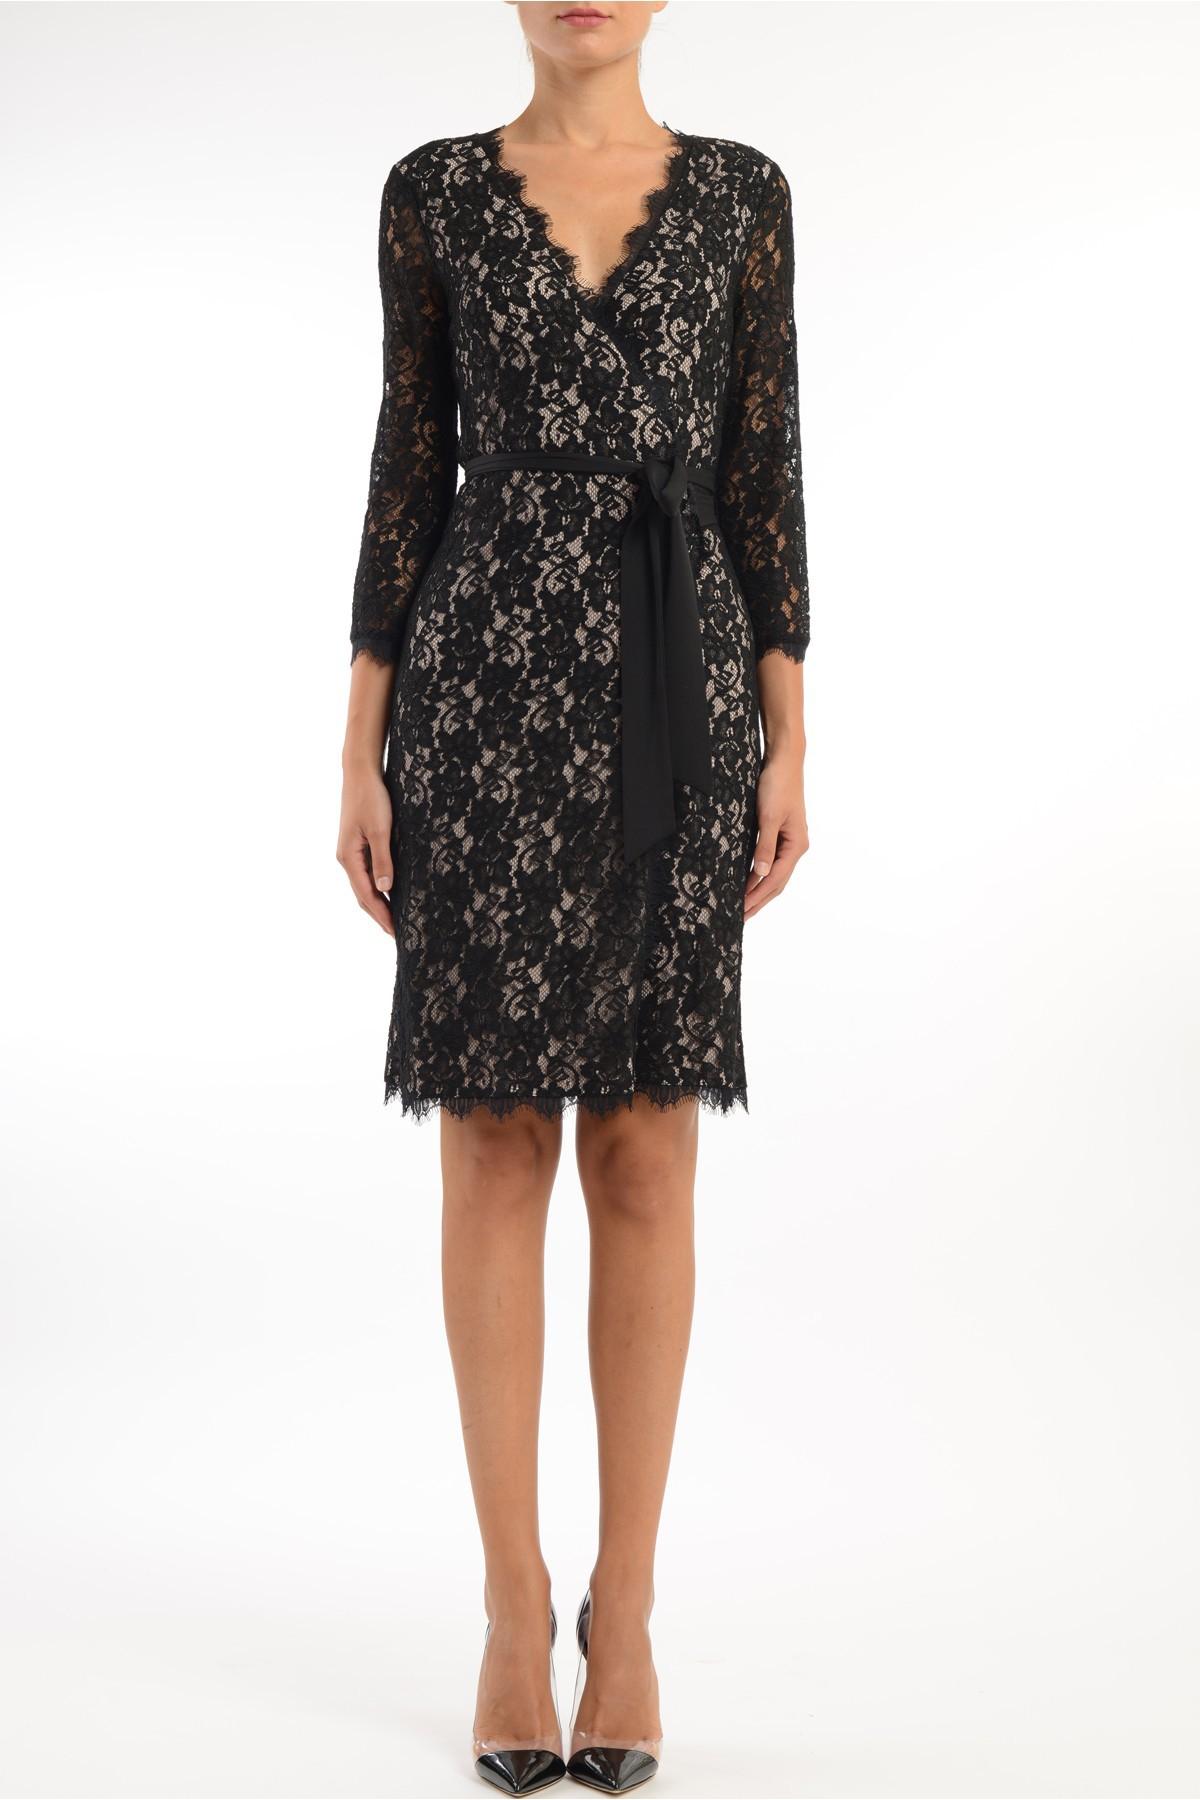 diane furstenberg lace dress with fabric belt in black